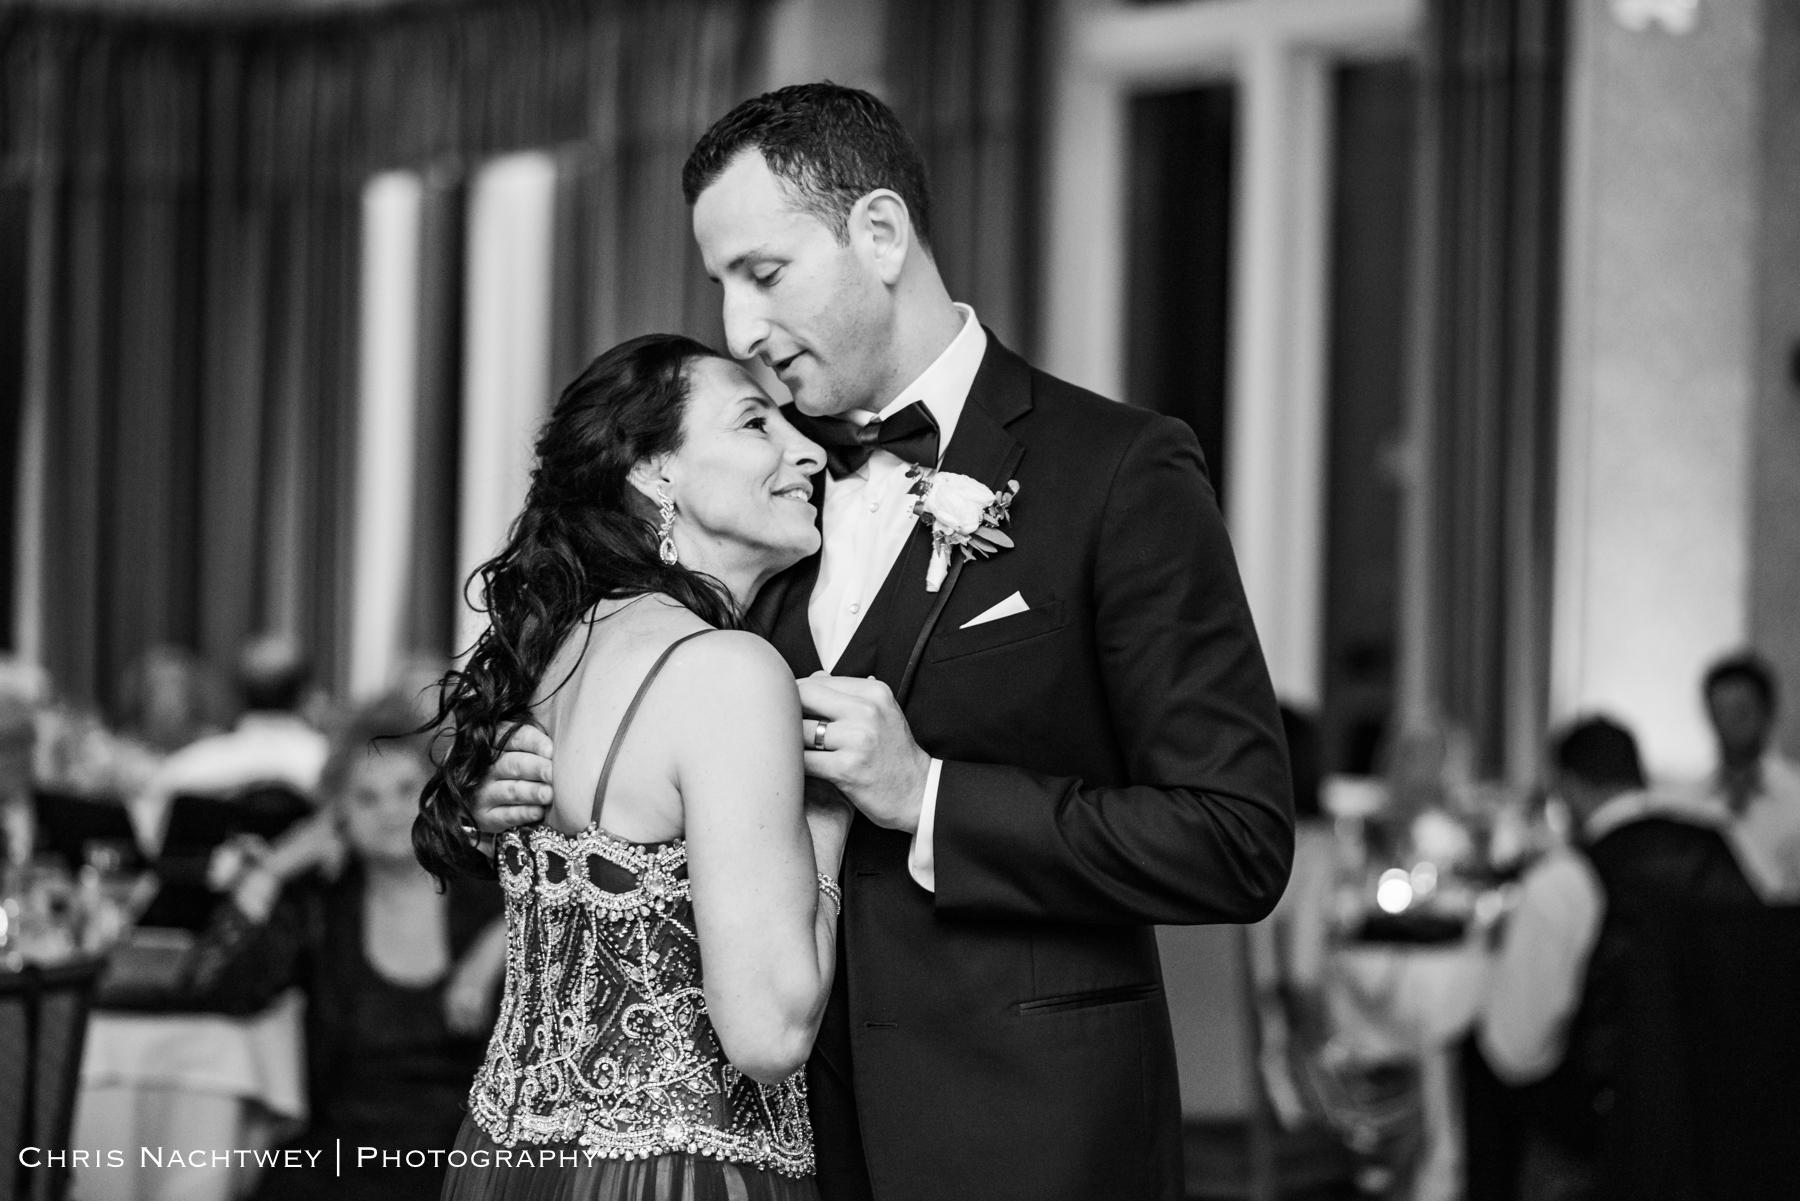 wedding-lake-of-isles-photos-chris-nachtwey-photography-2019-66.jpg